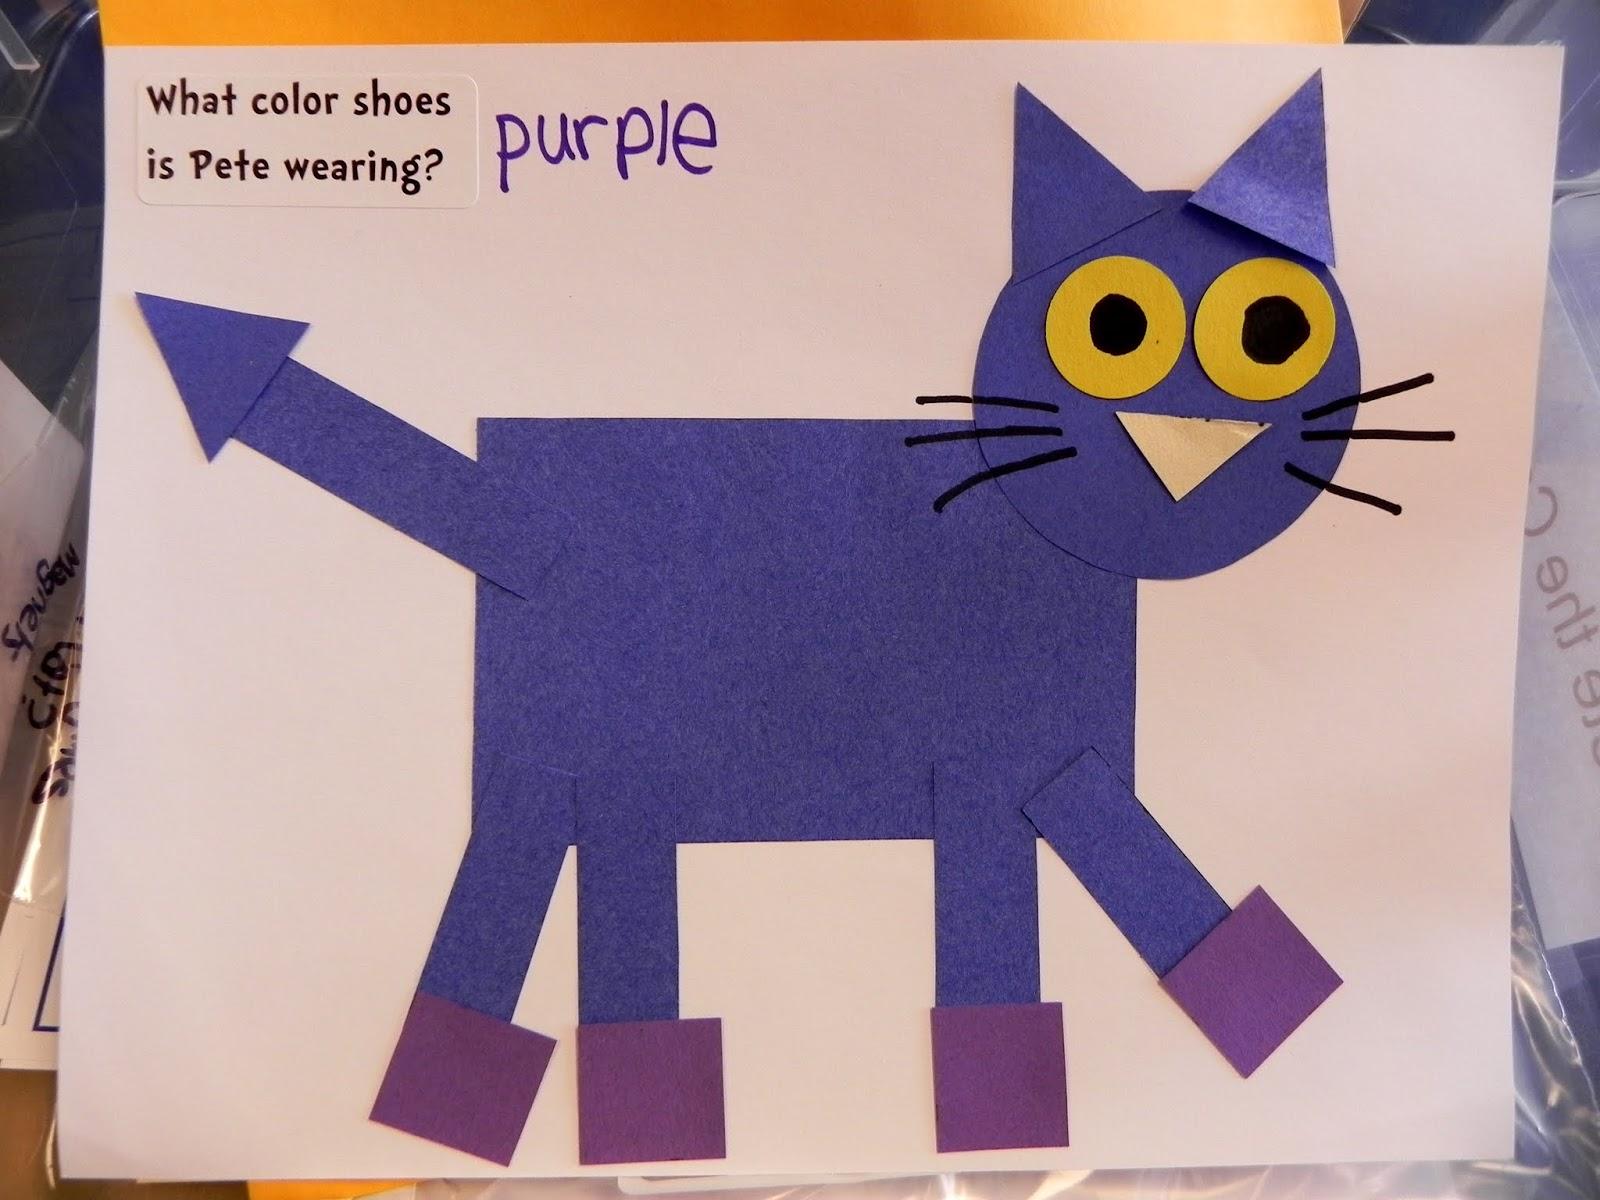 Pete The Cat Out Of Shapes Swampscott Public Library